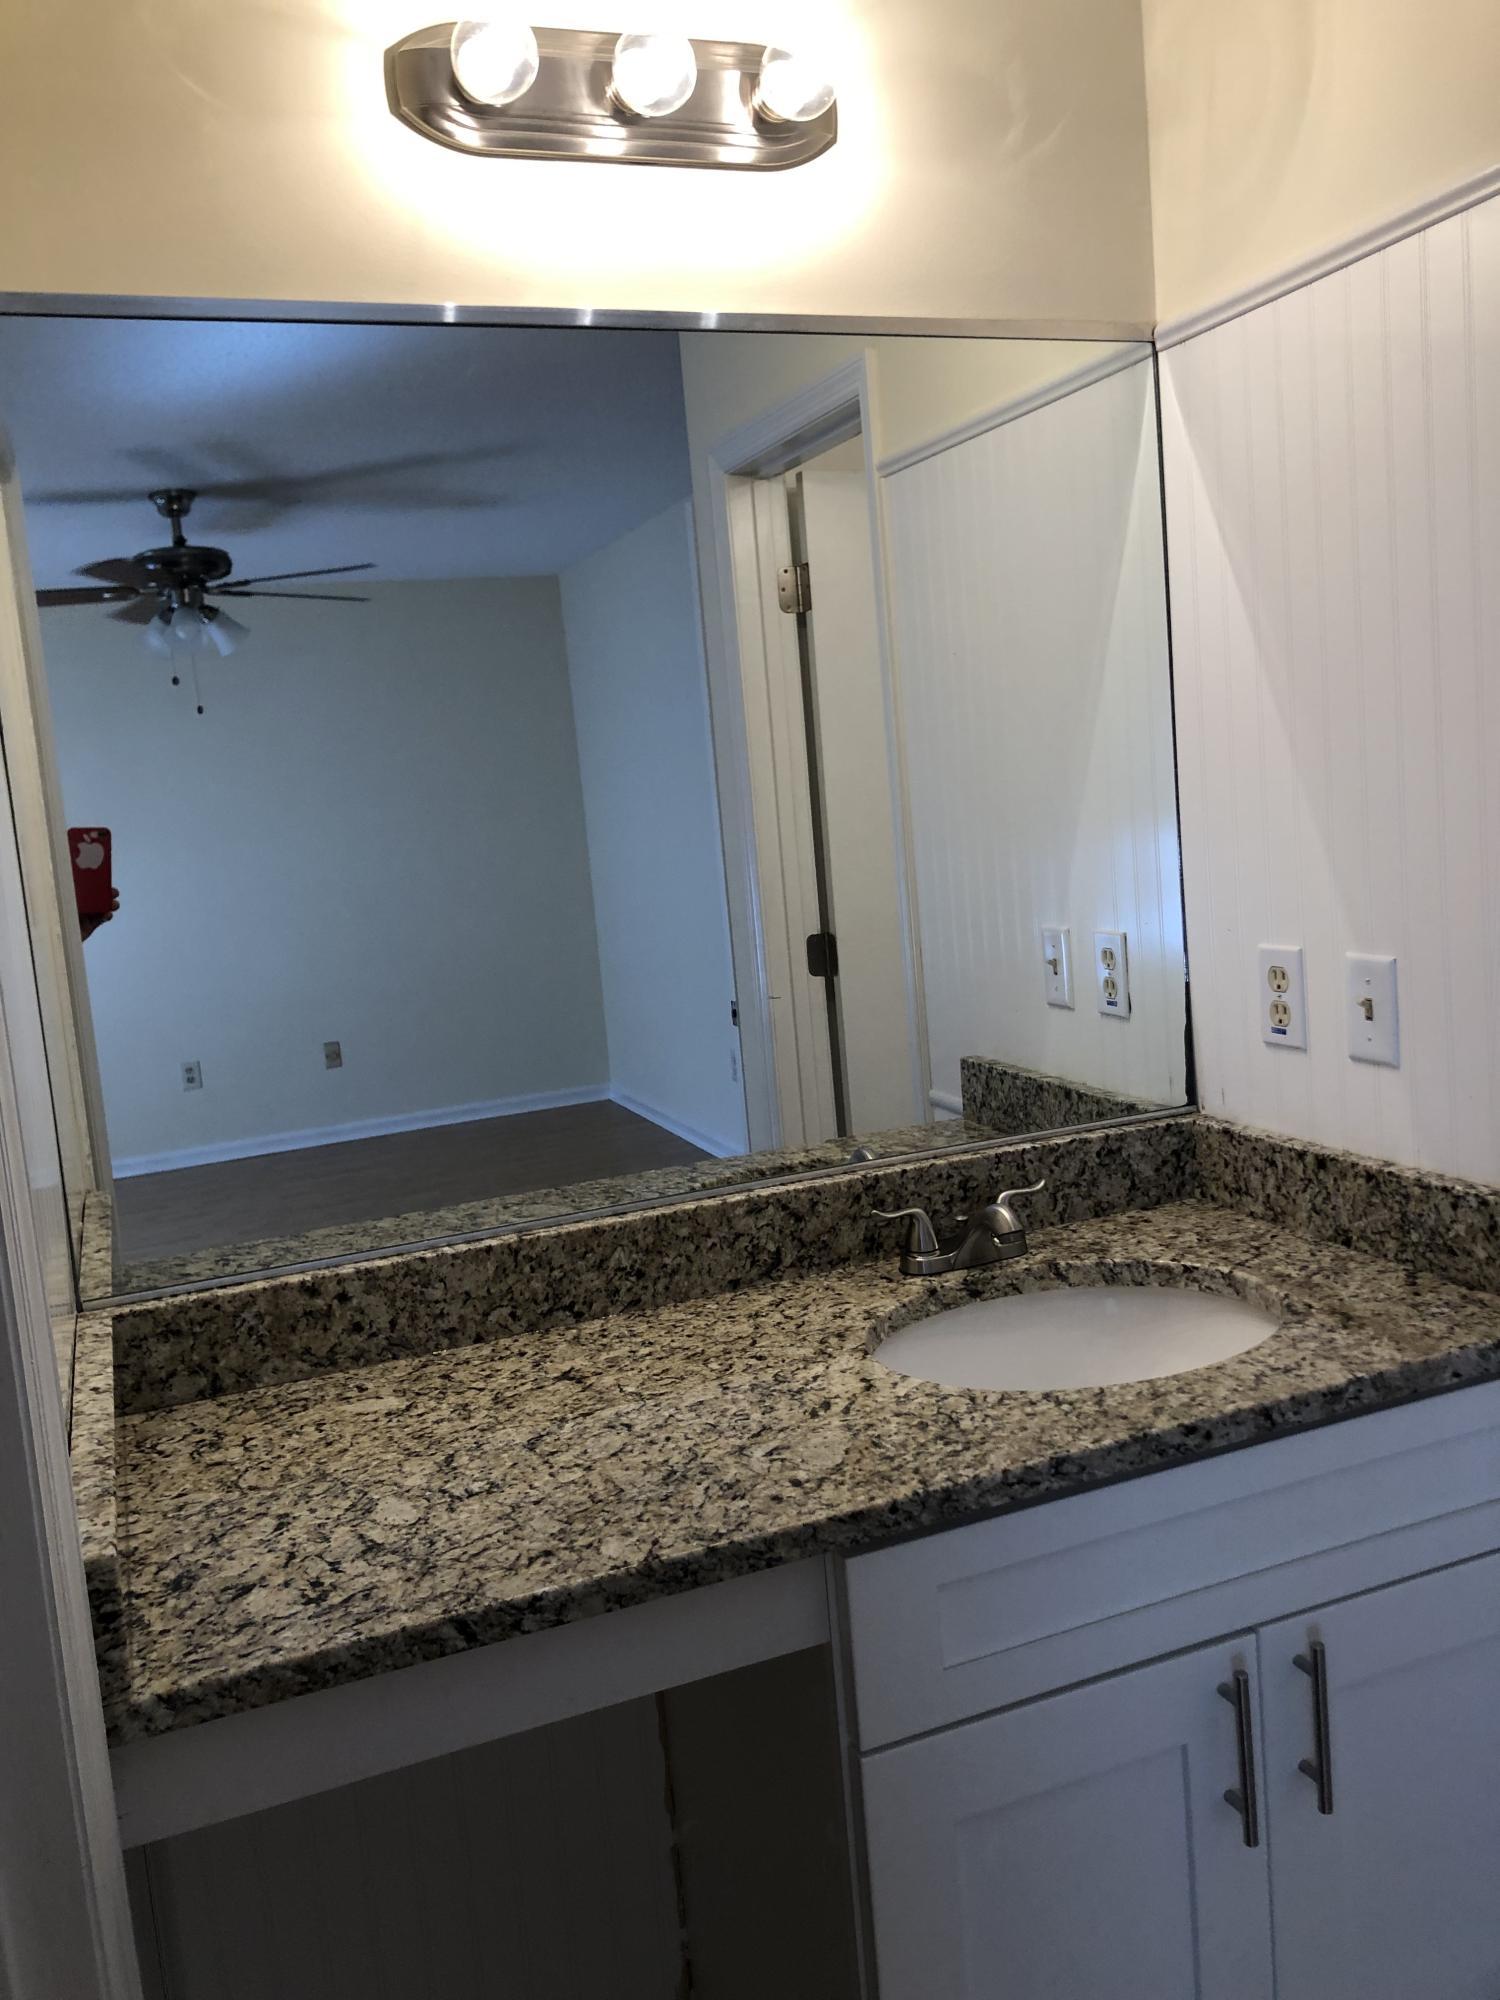 The Cedars Homes For Sale - 4075 Cedars, North Charleston, SC - 19